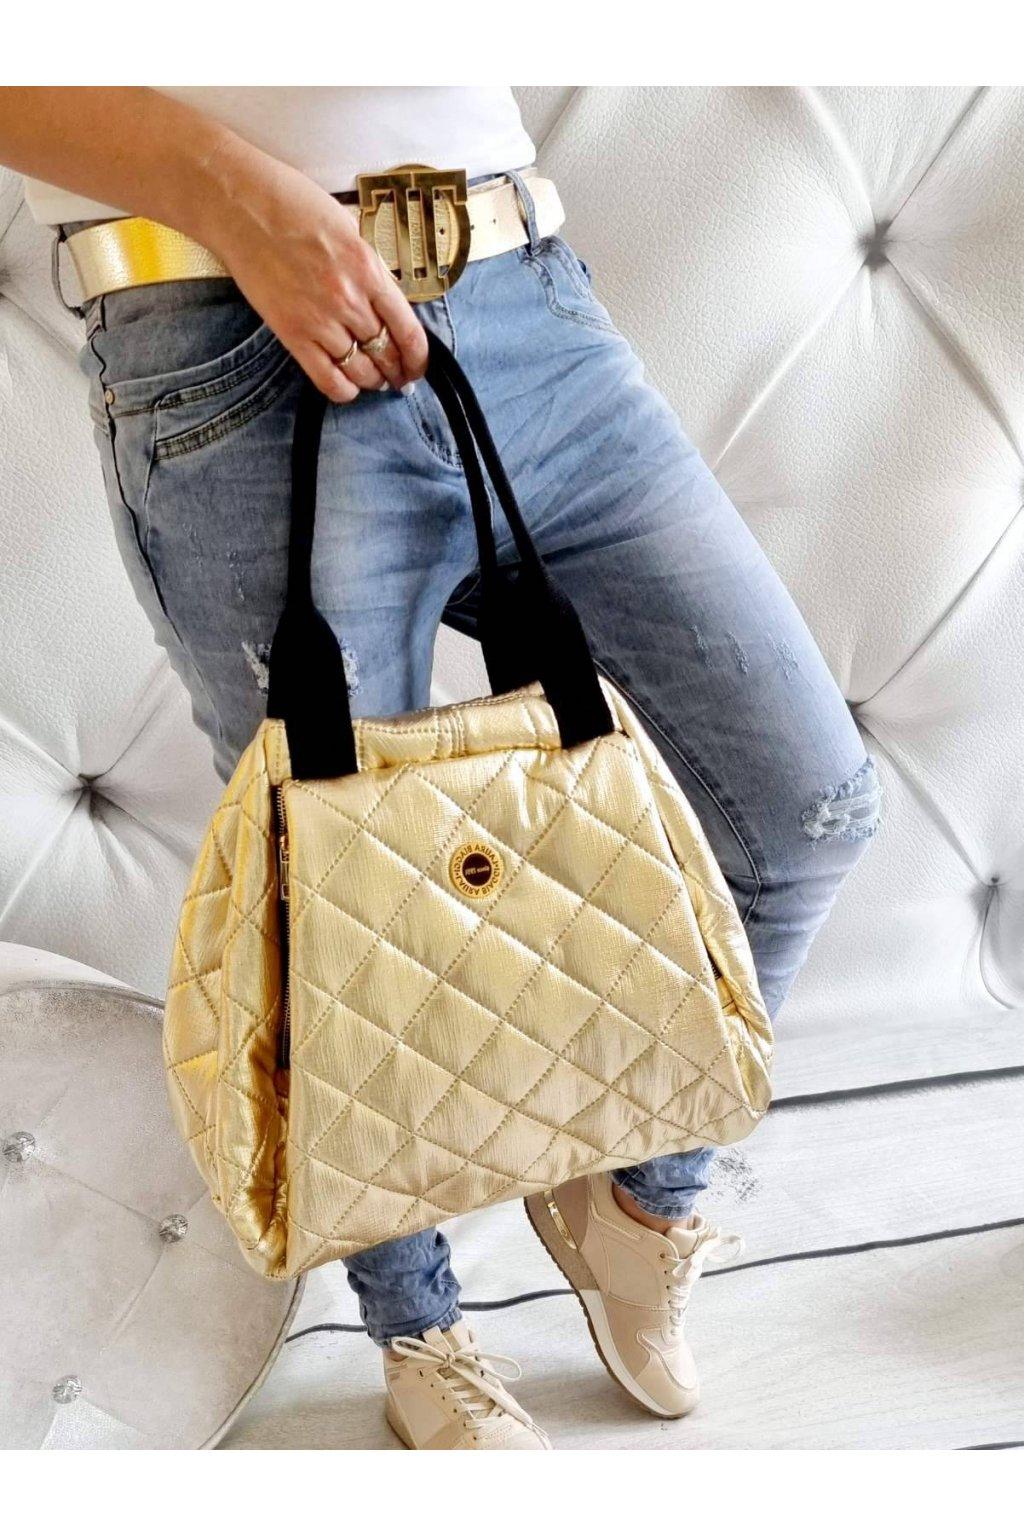 KABELKA laura biaggi extravagant trendy značková luxusní kabelka